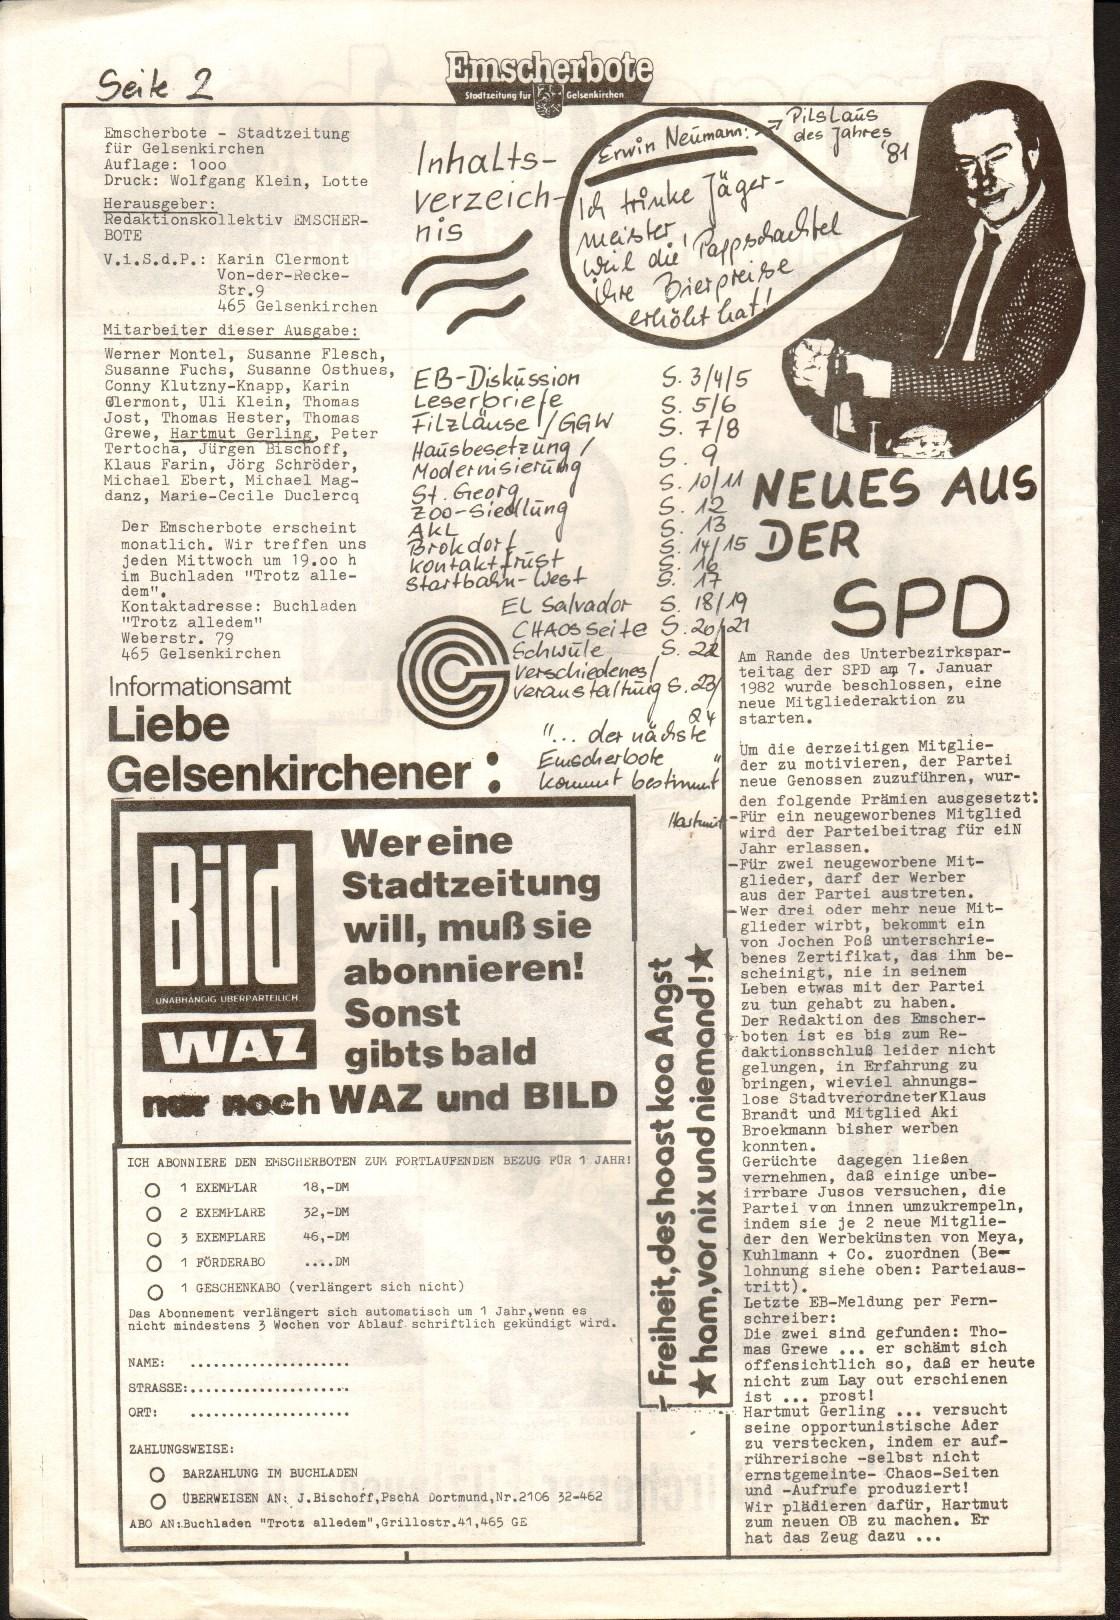 Gelsenkirchen_Emscherbote_1982_14_02